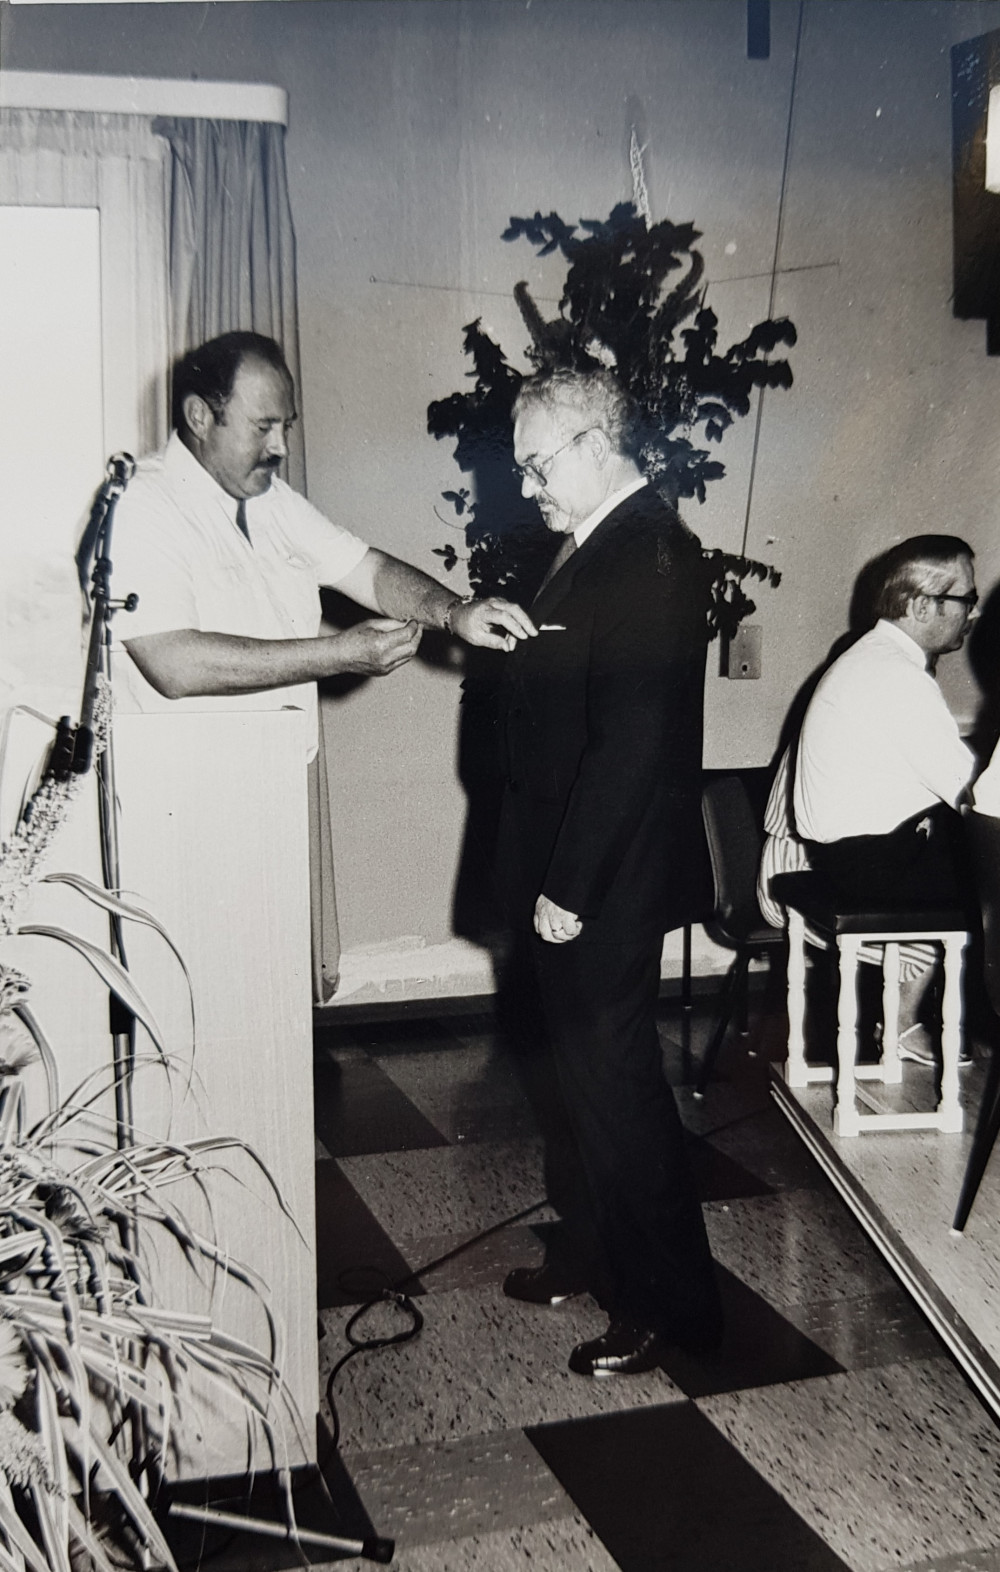 Dr. Ludwig handrich bekommt den Verdienstorden der Bundesrepublik Deutschlands